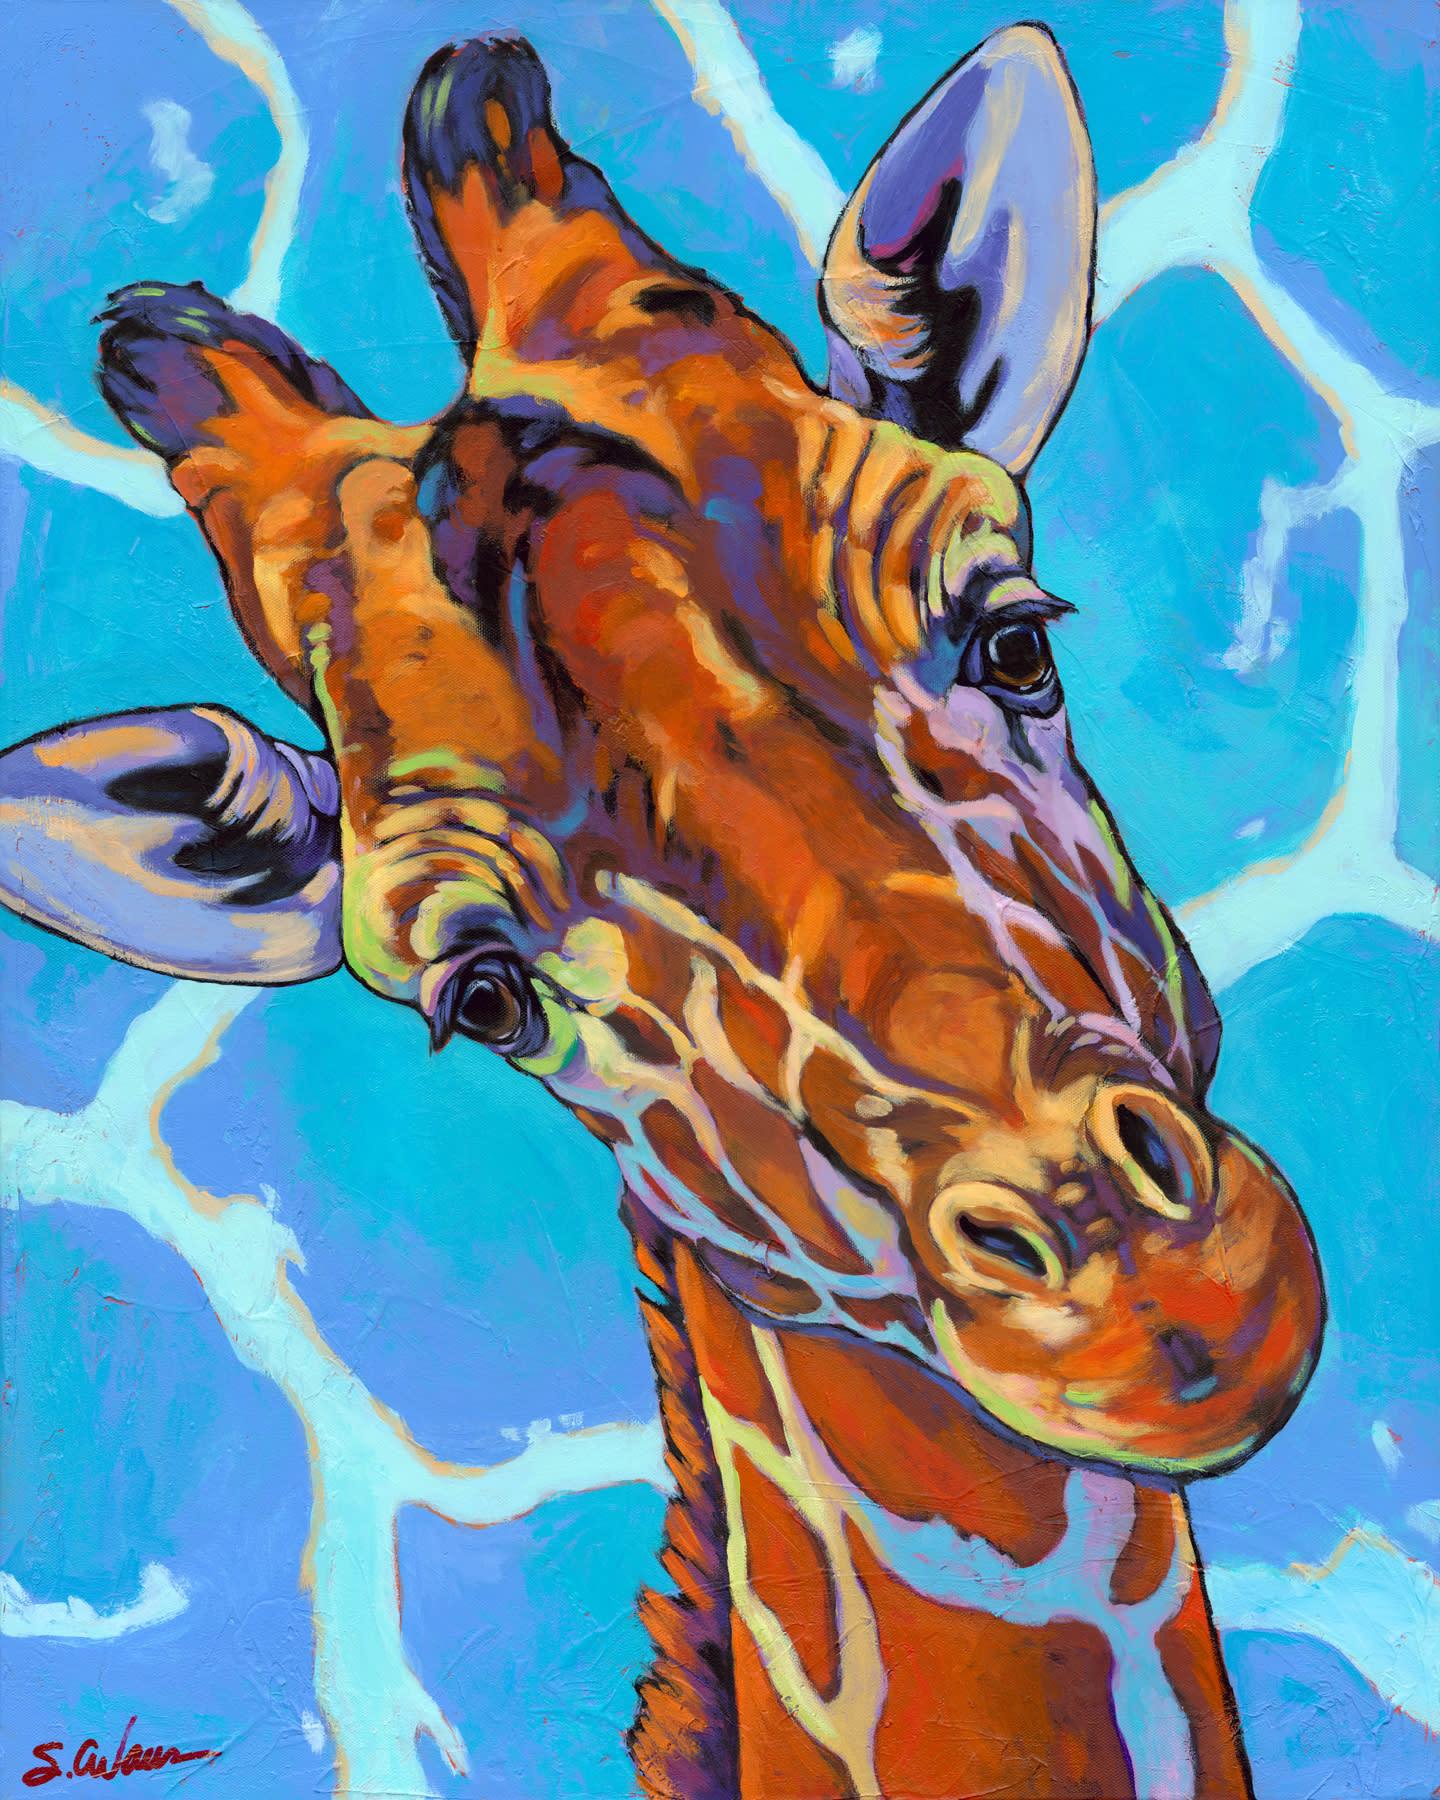 Giraffe world sm aesz8h